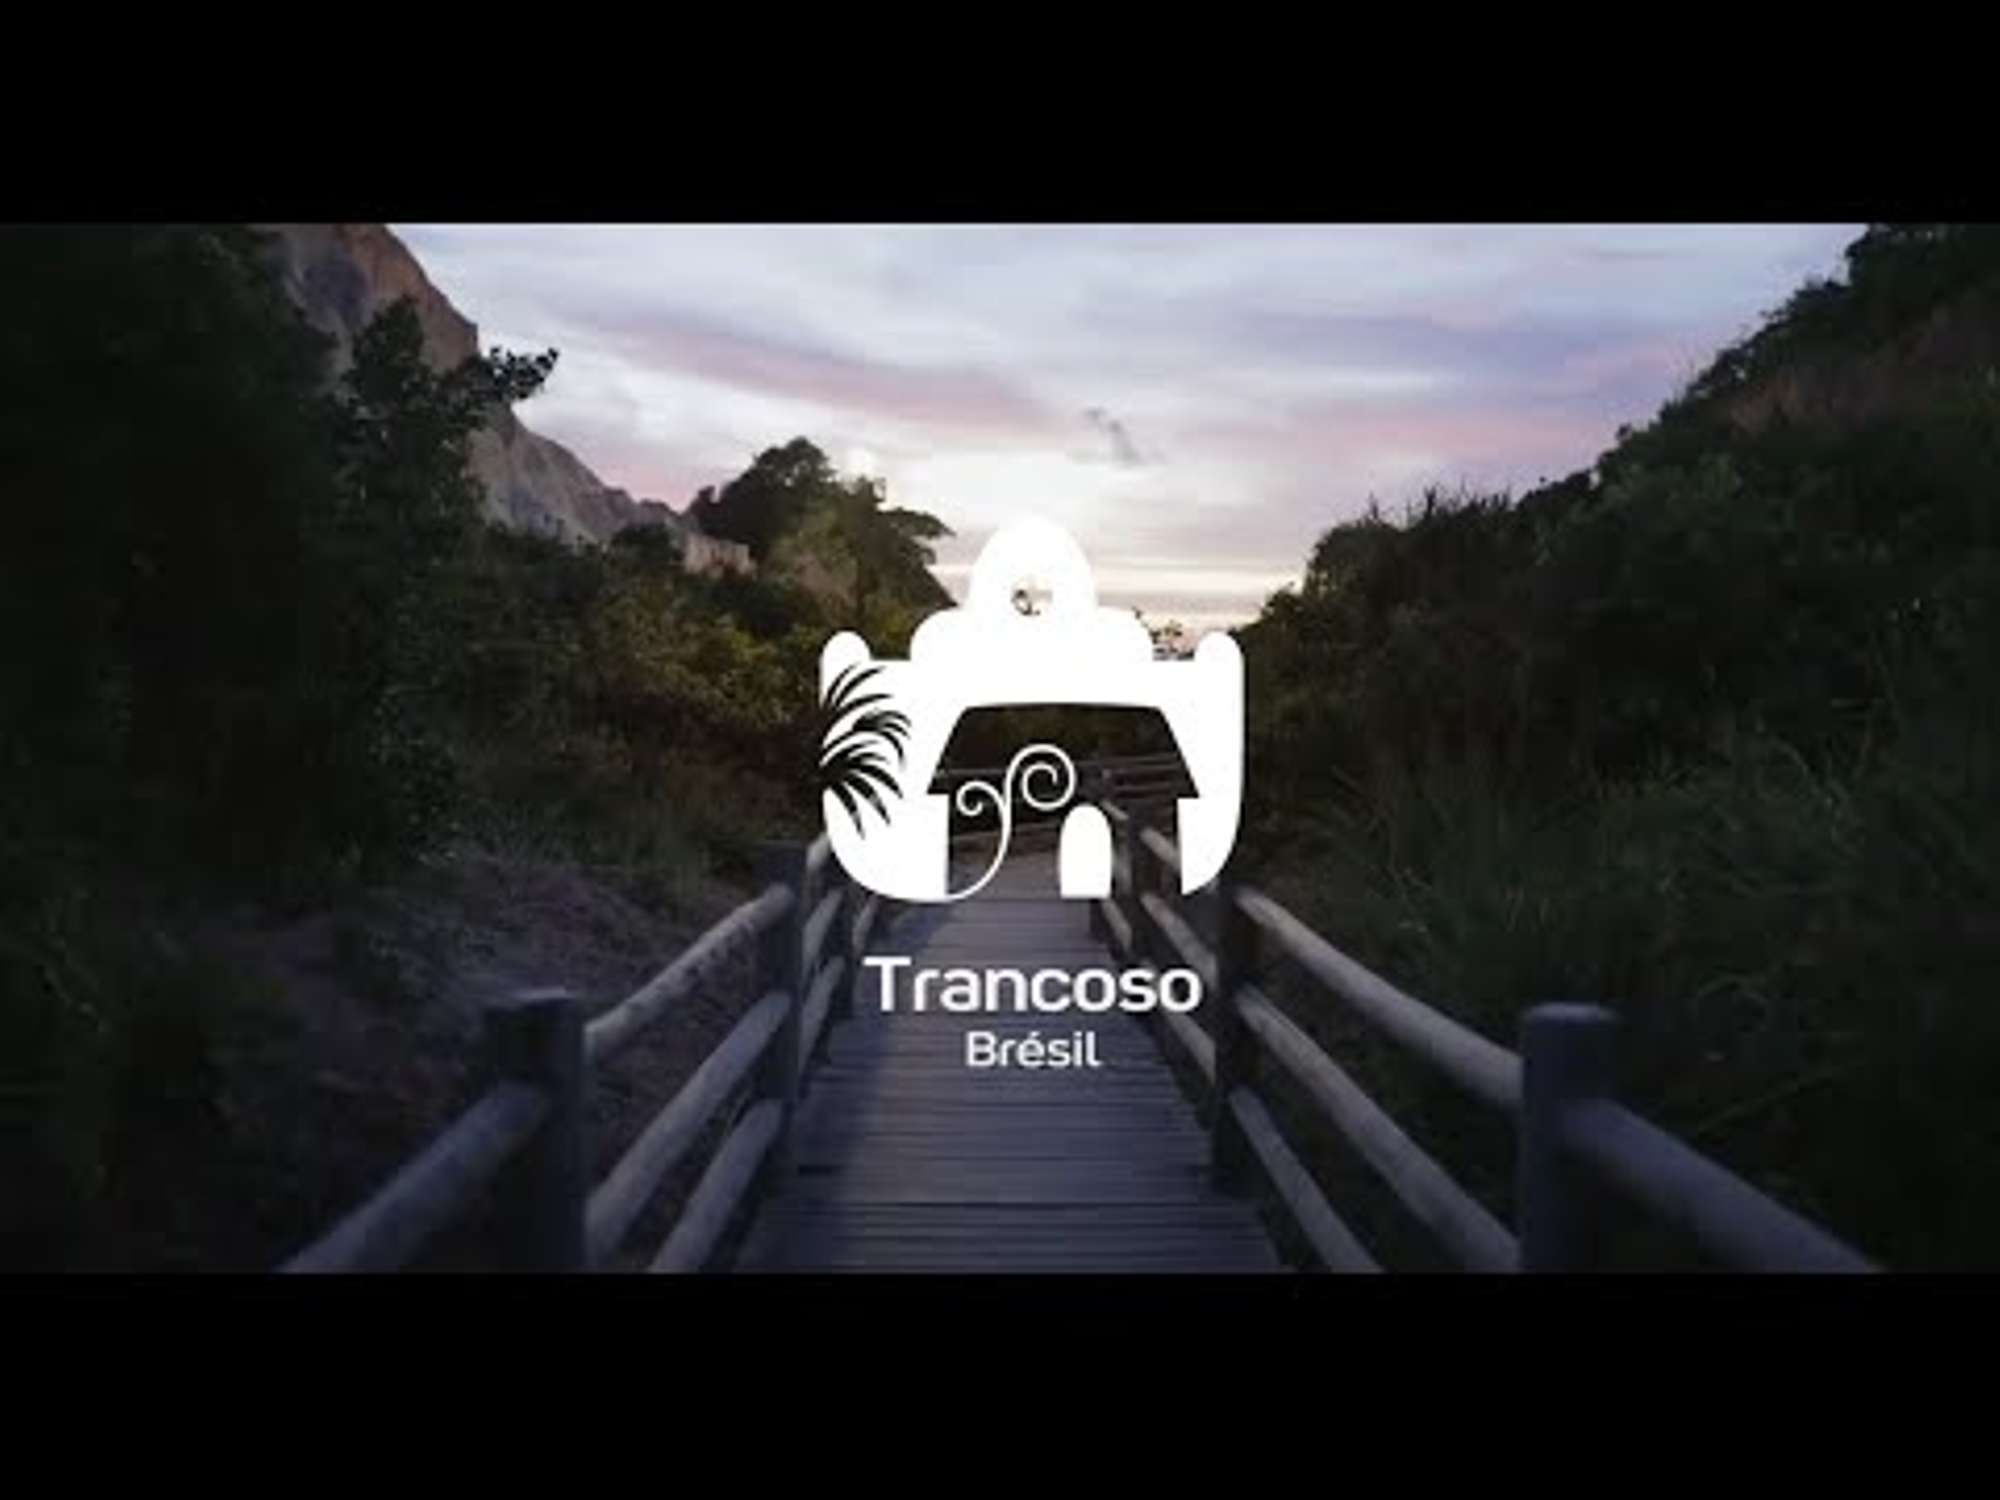 Open Trancoso Vidéos slideshow gallery at 1